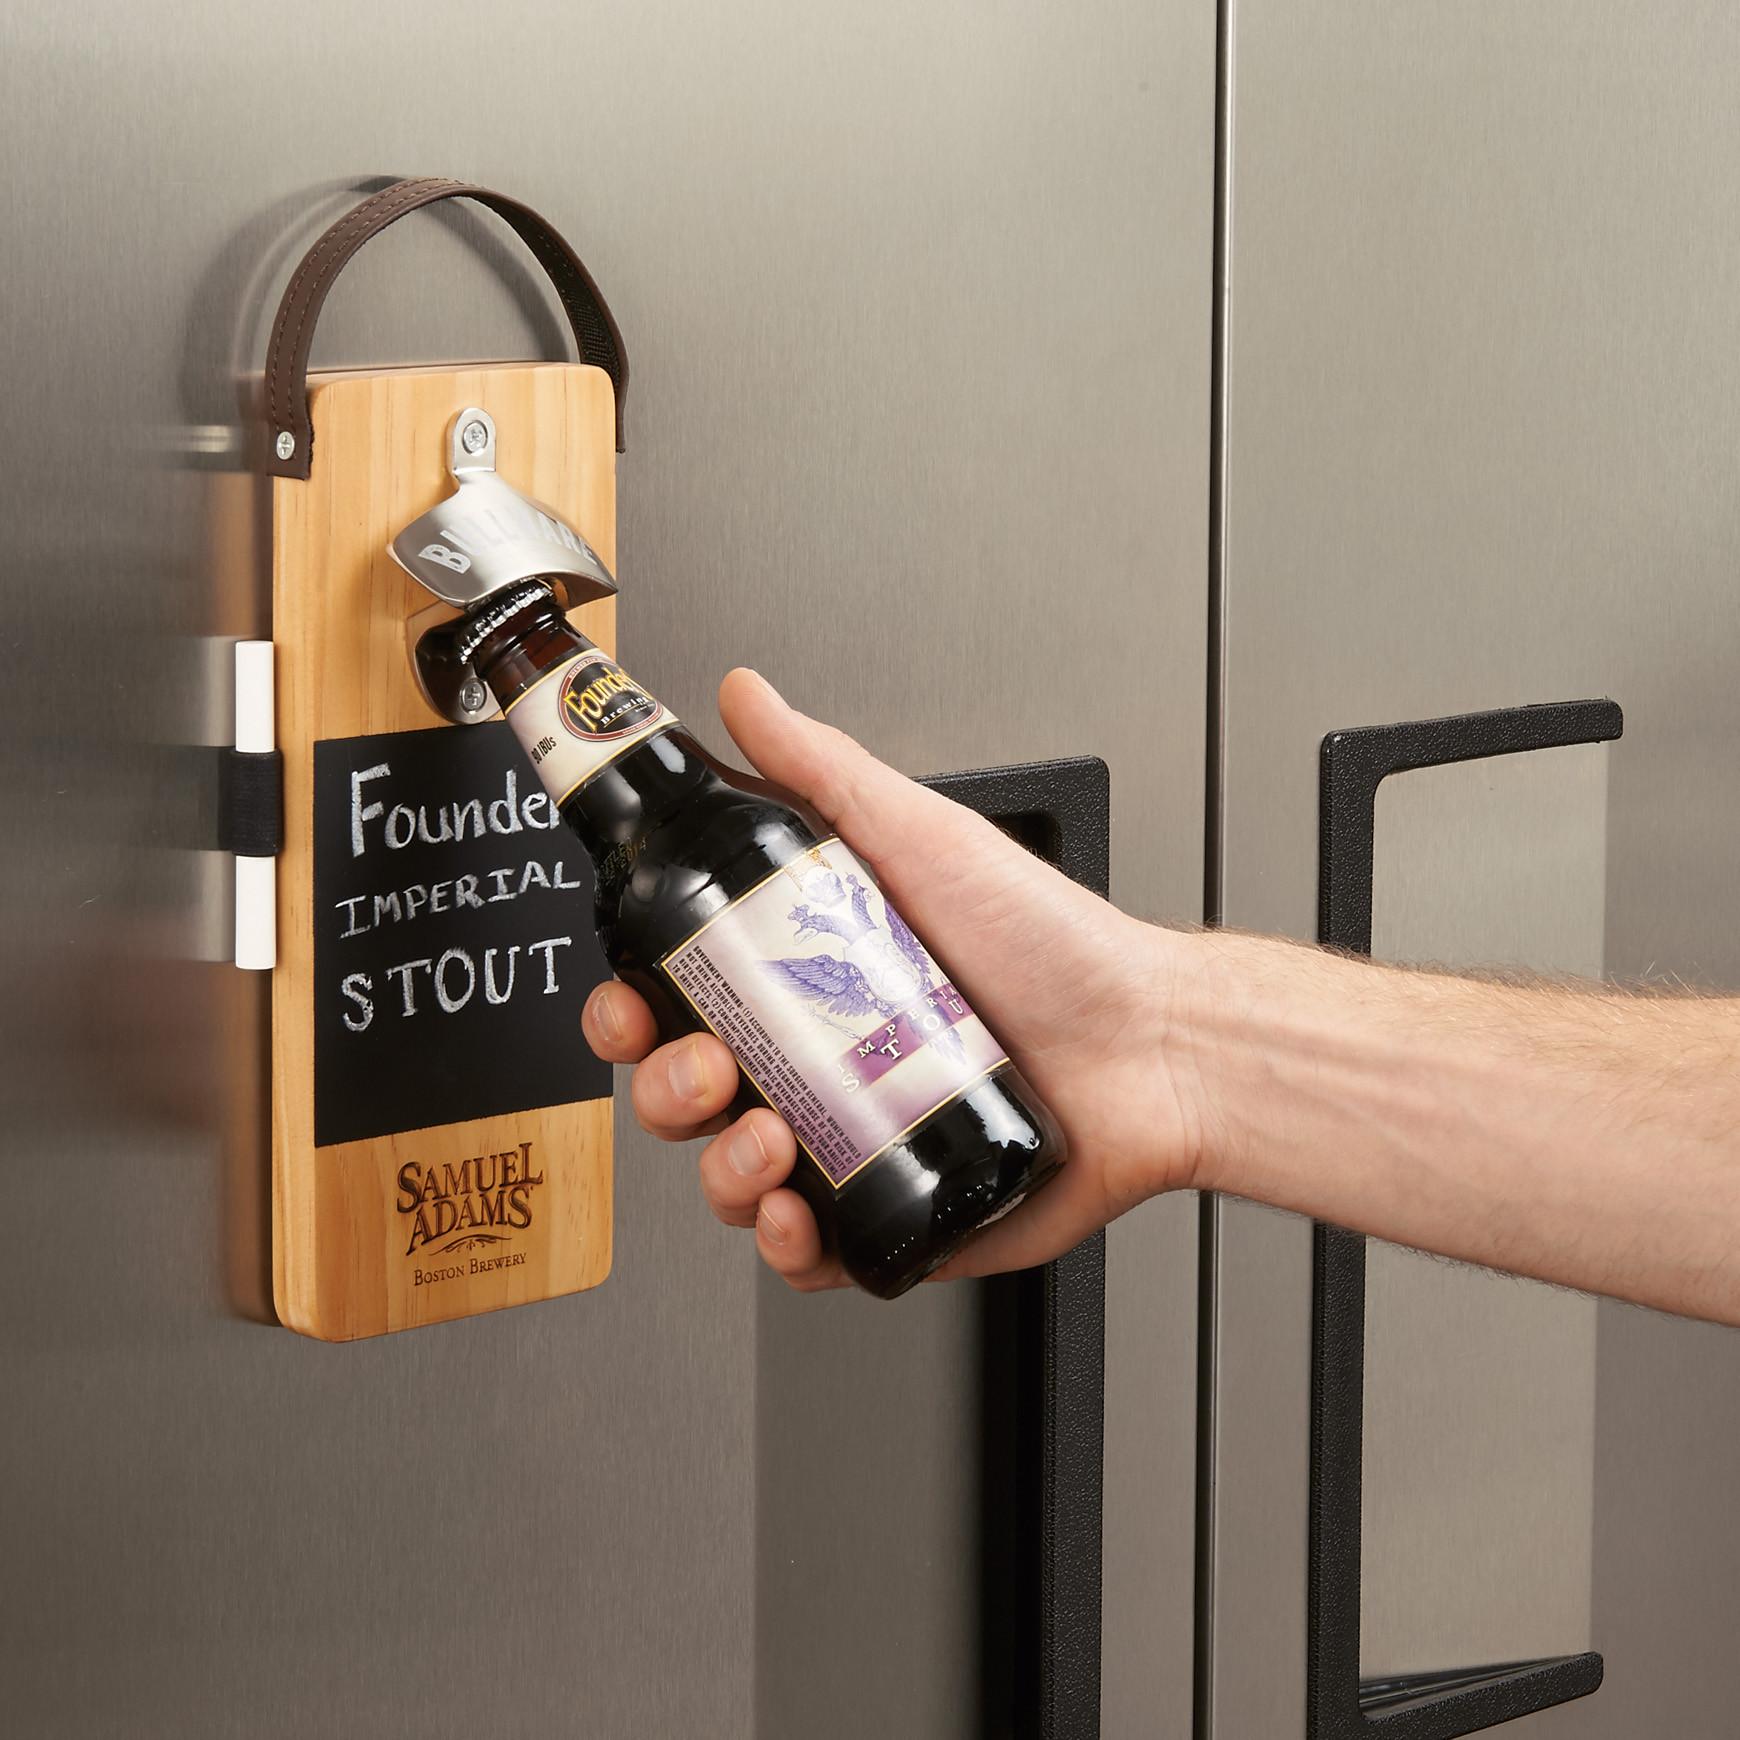 bullware-wall-mounted-wood-bottle-opener2-lee-9r98